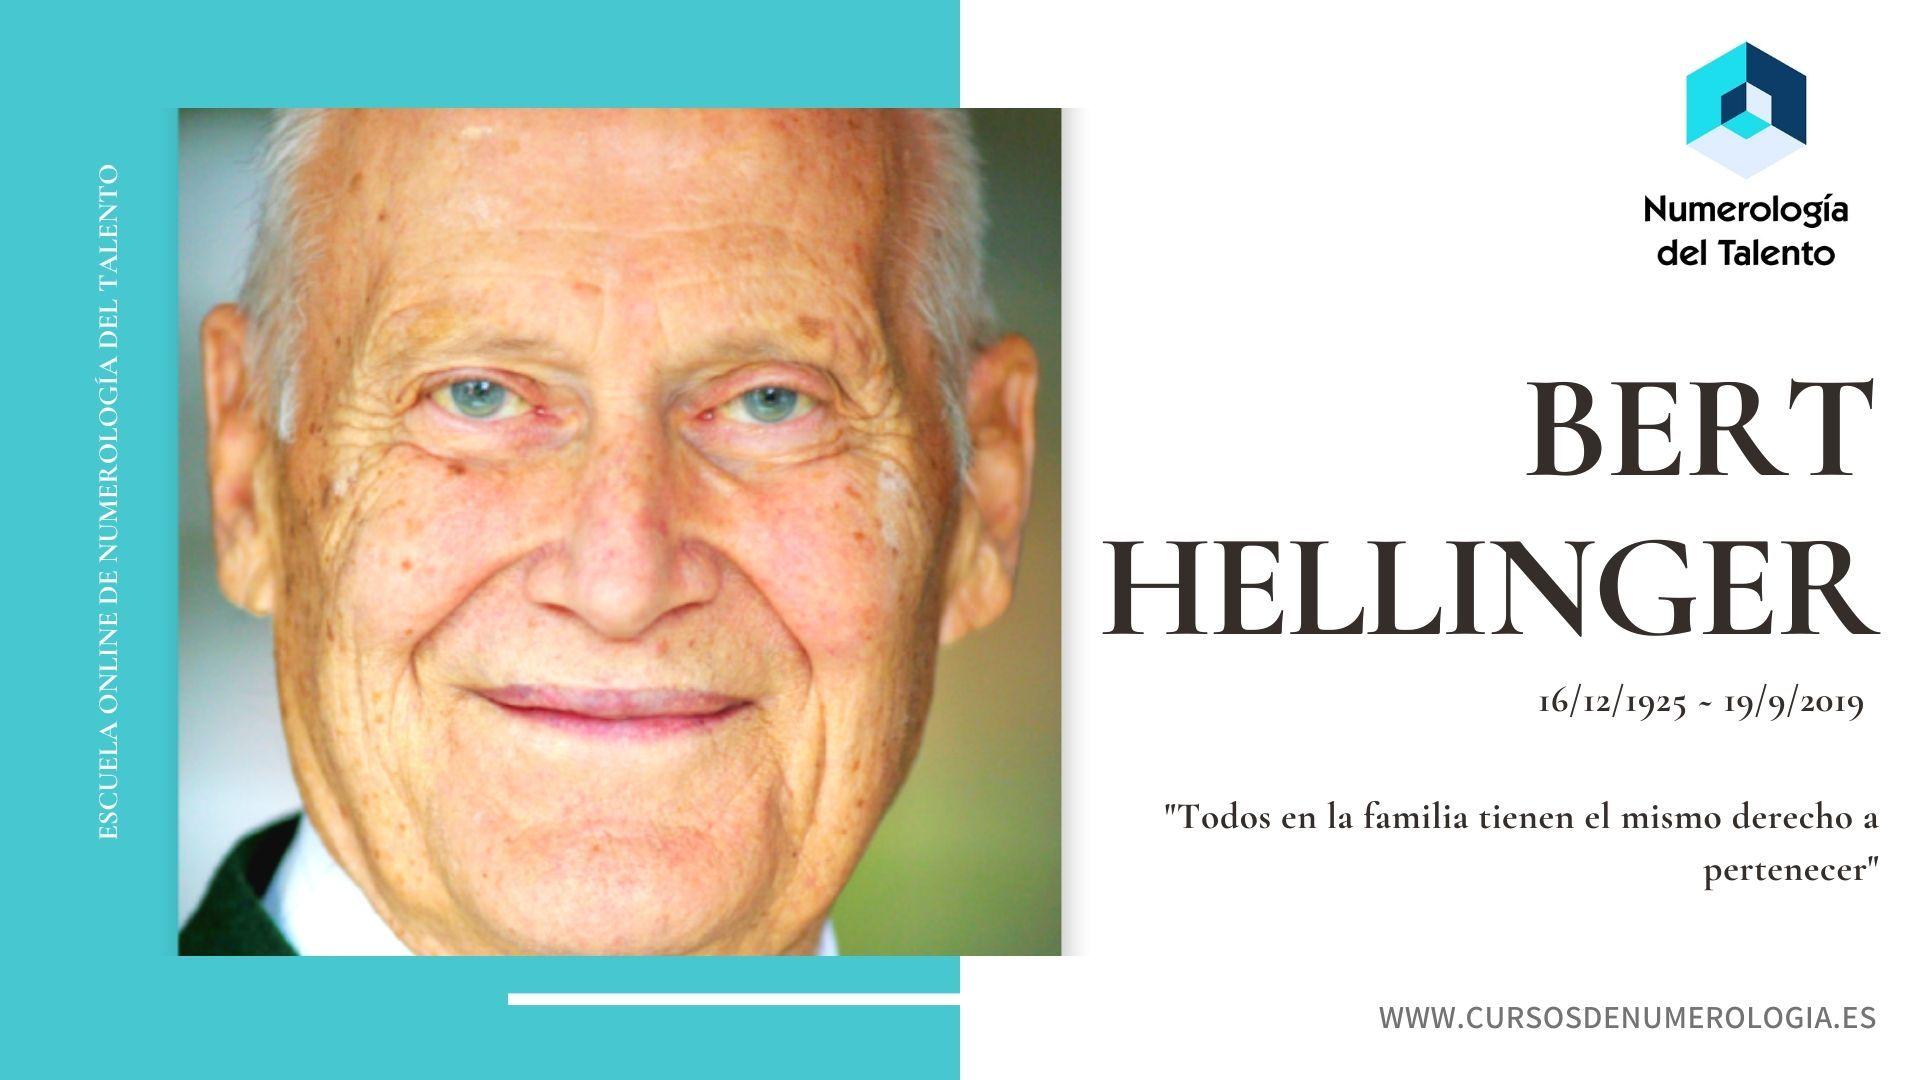 Numerología de Bert Hellinger